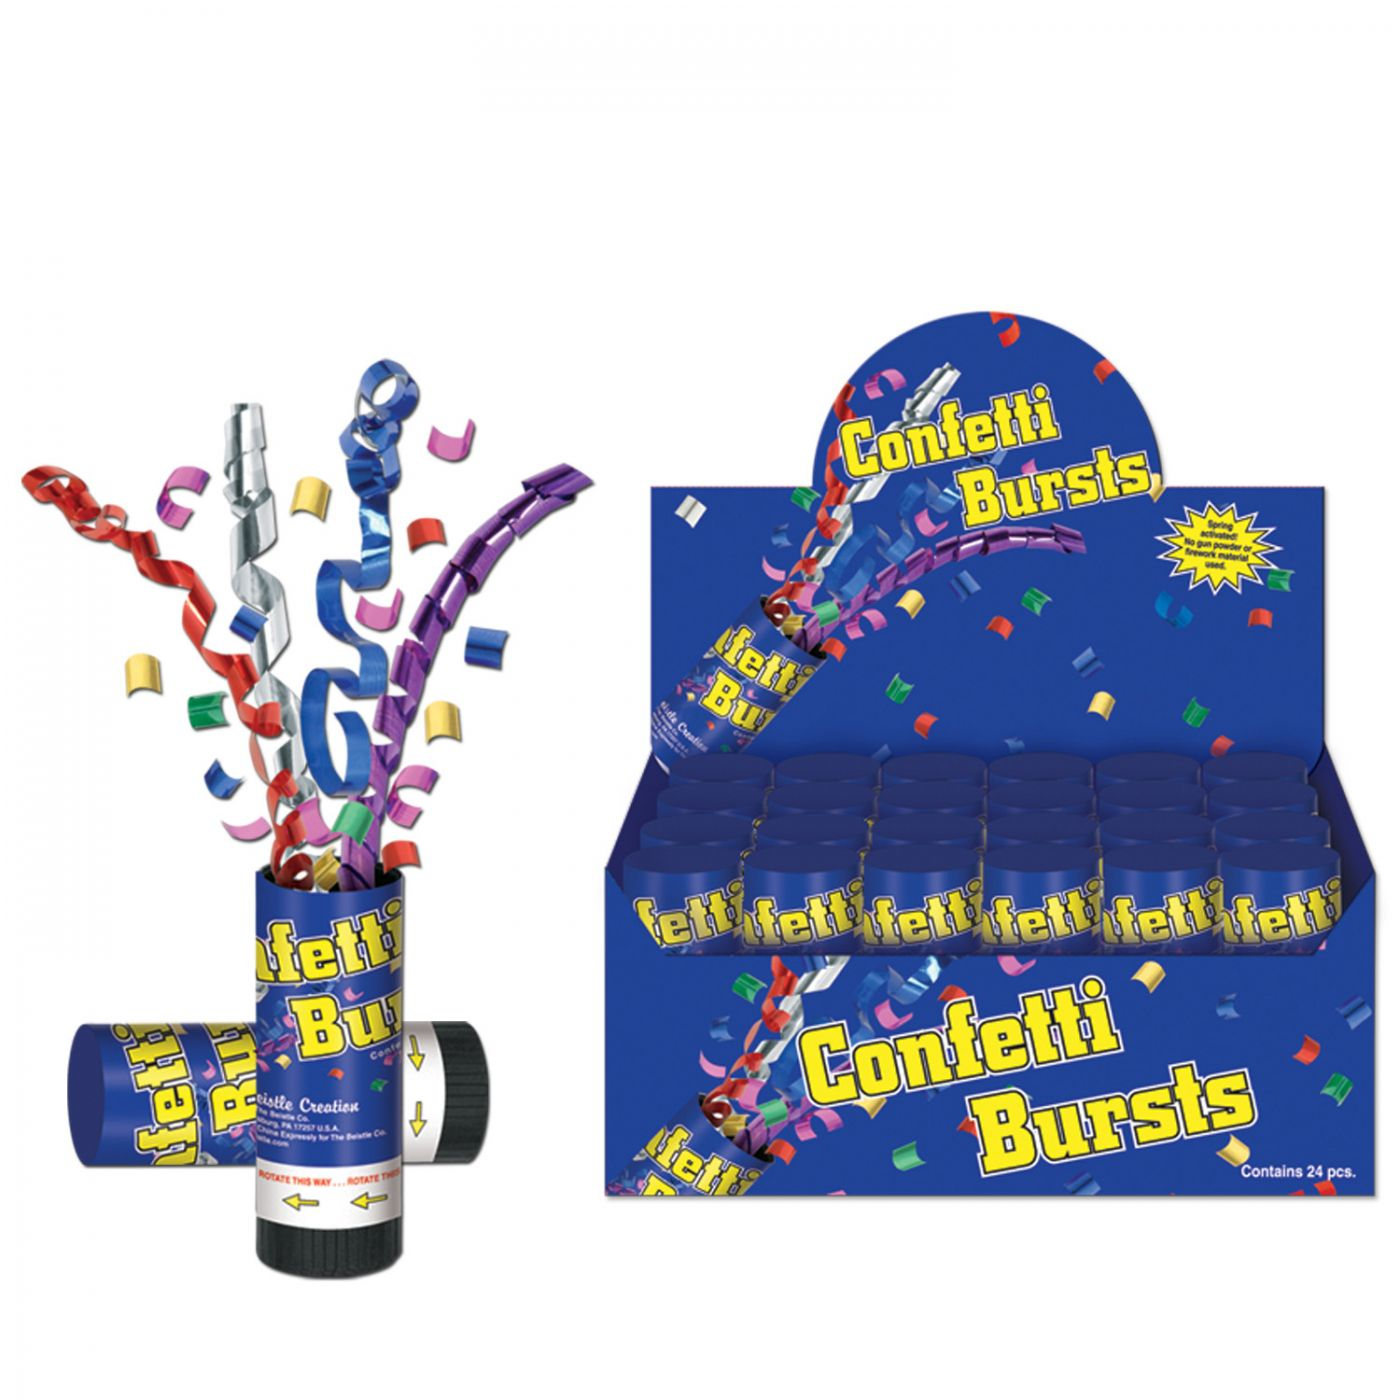 Confetti Bursts (24) image